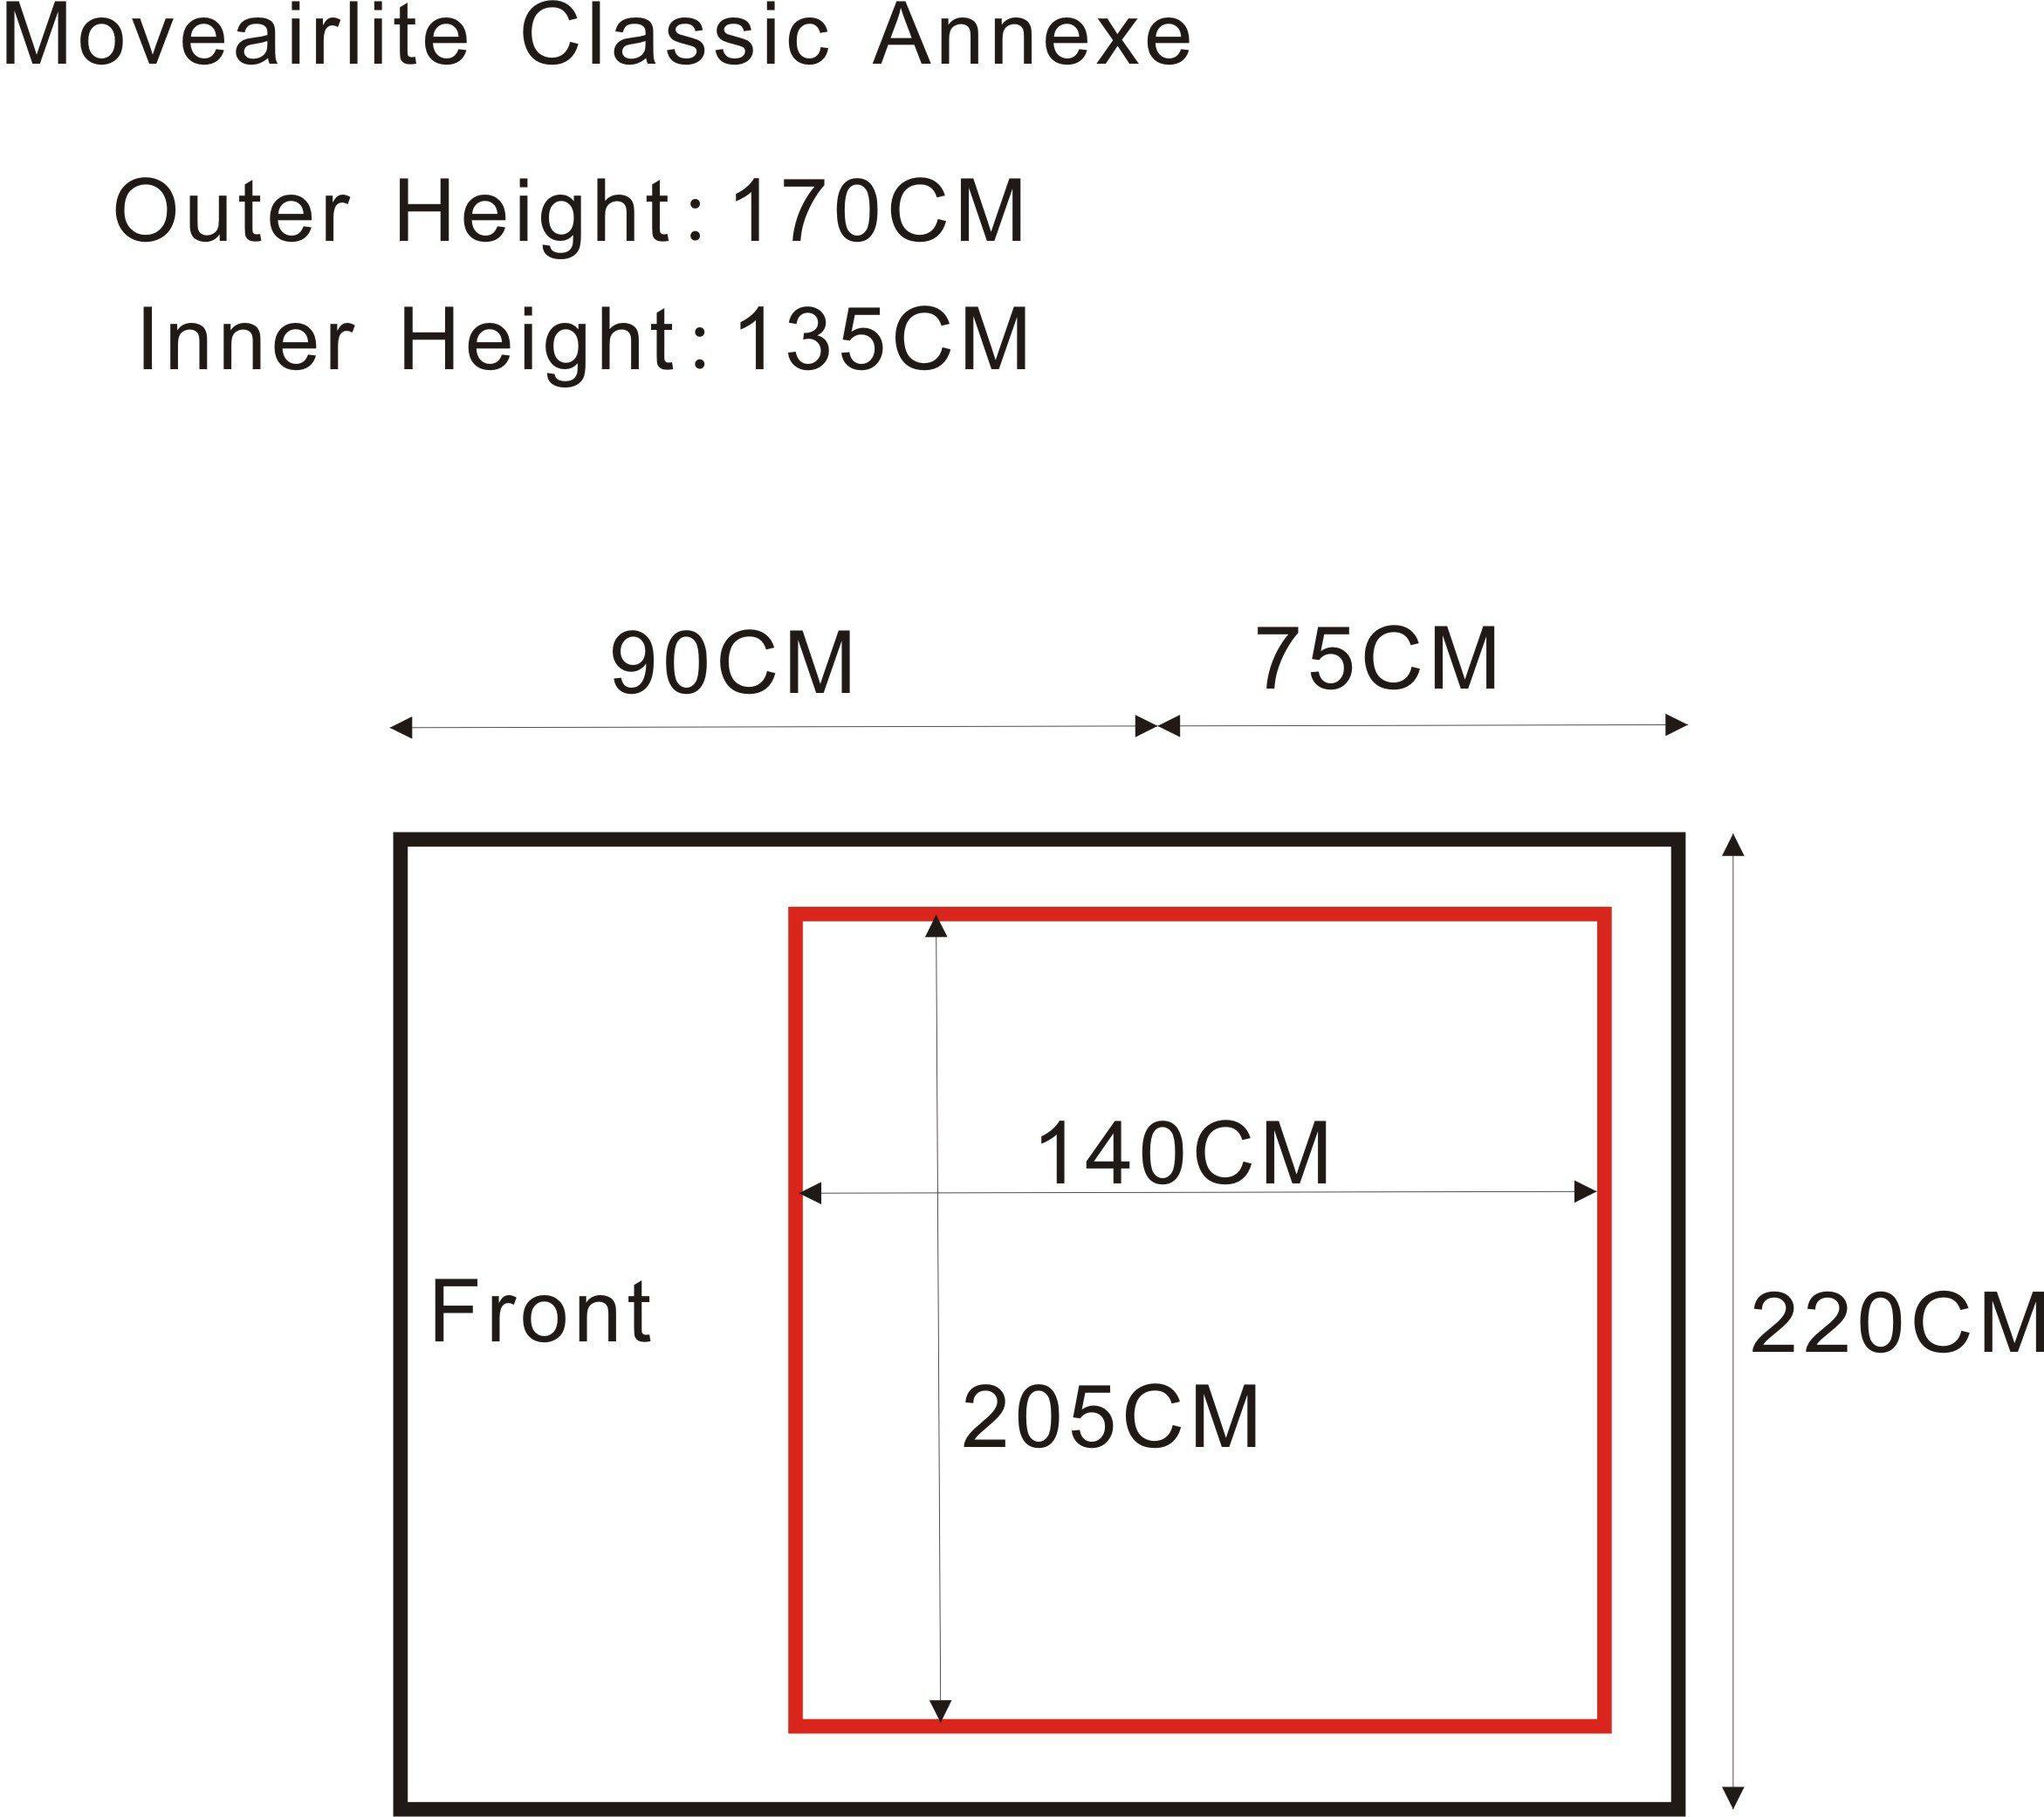 Moveairlite Classic Annexe